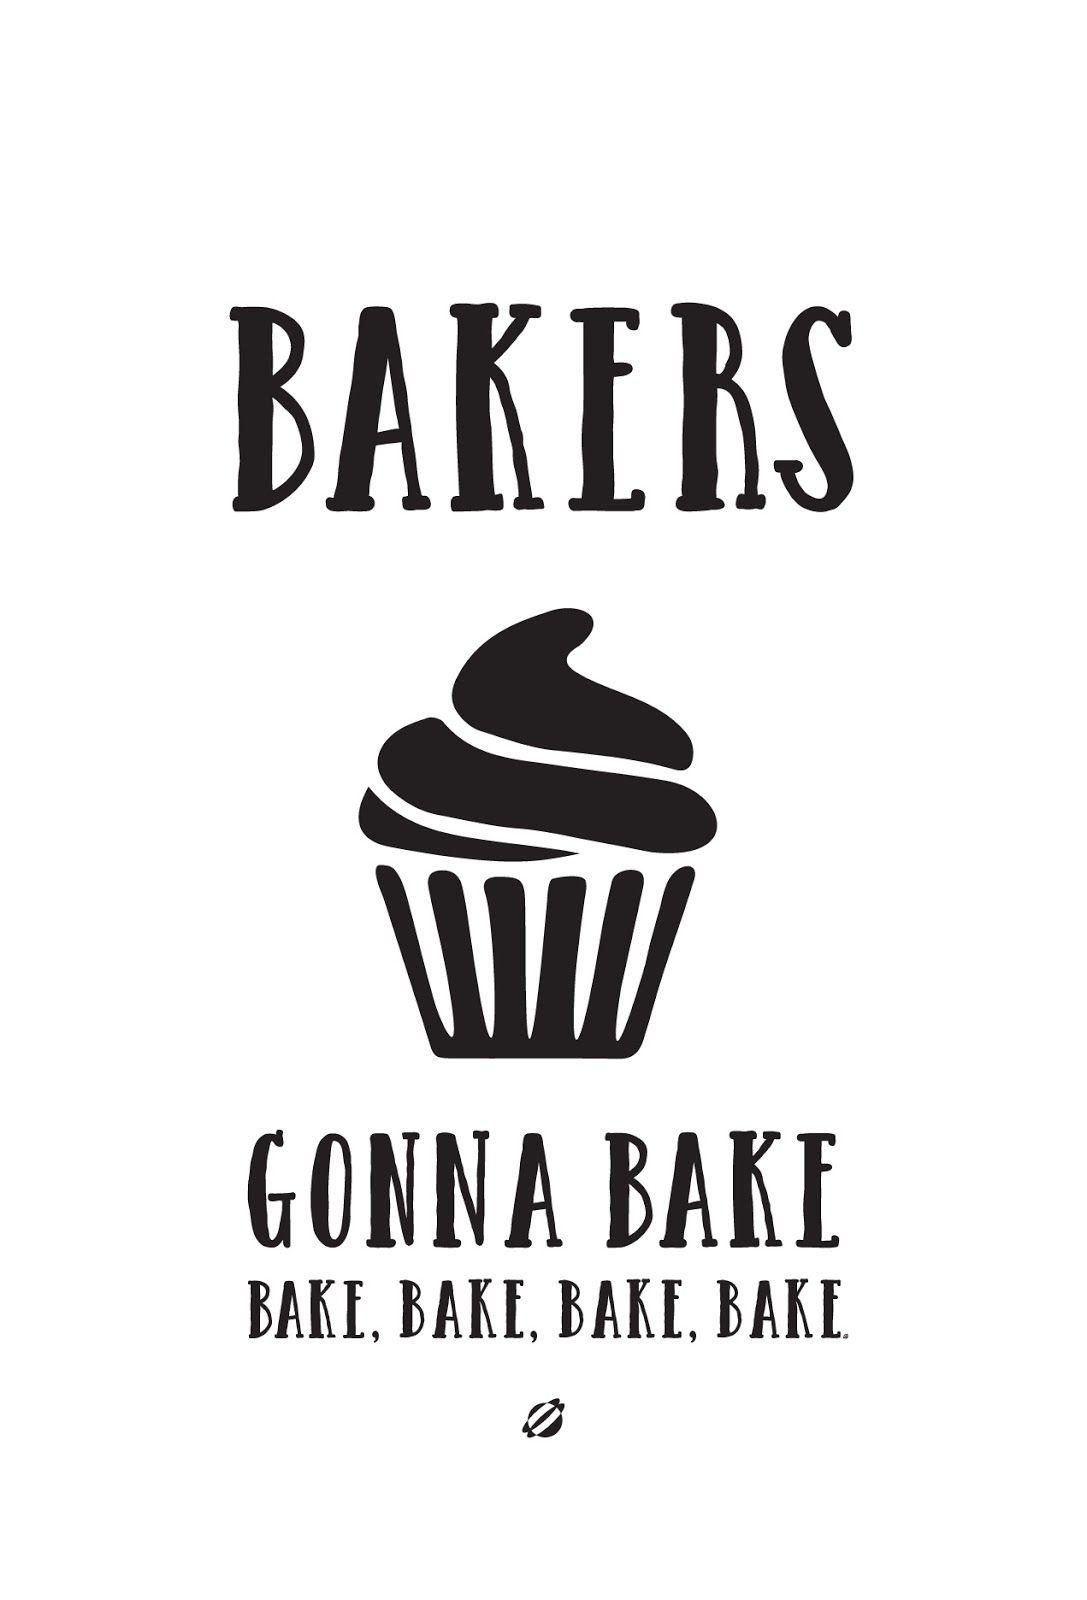 Bakers Gonna Bake.